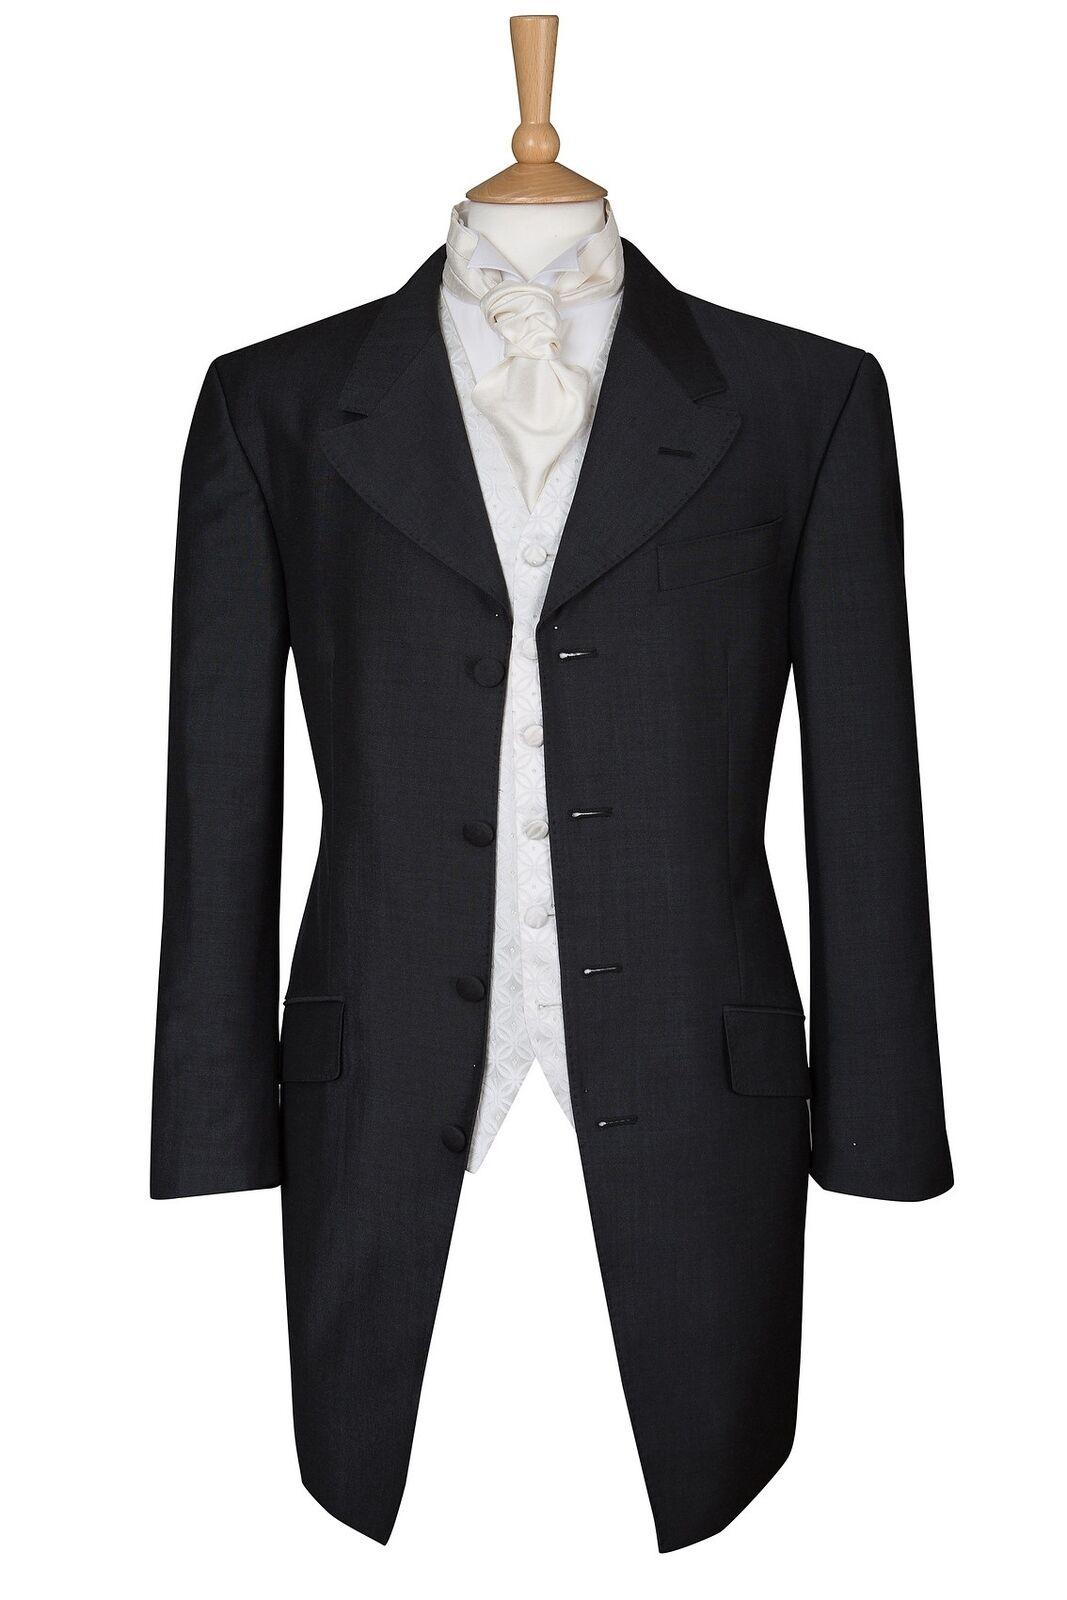 Prince Edward Charcoal Grey Jacket - Ex Hire